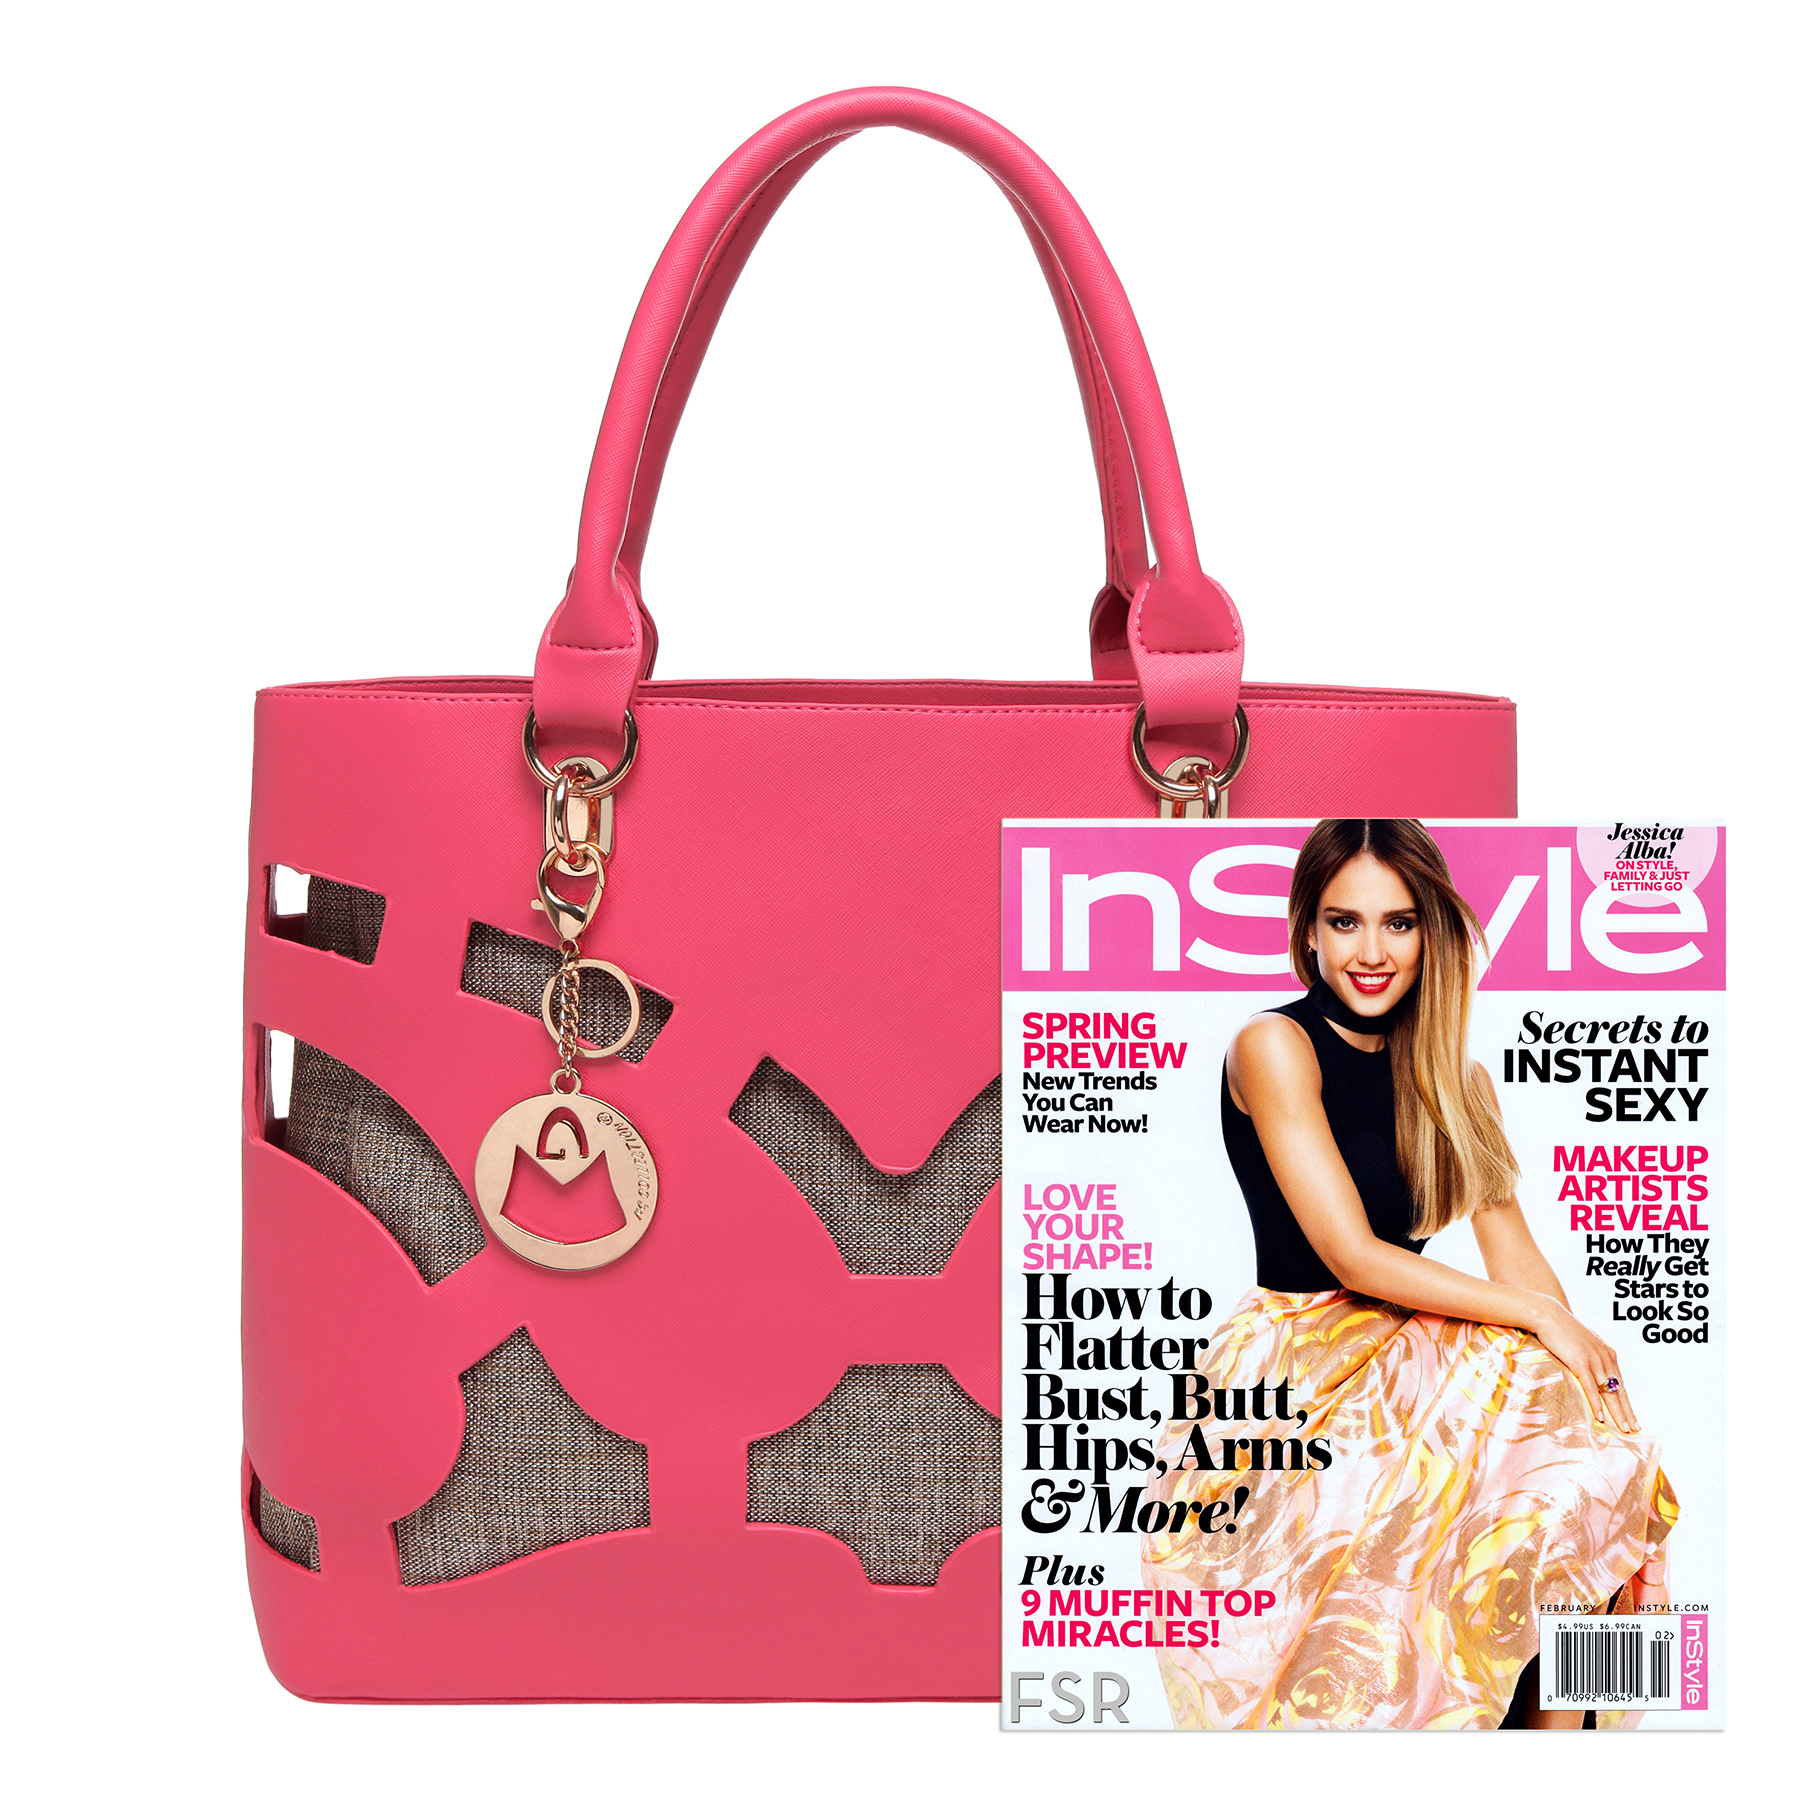 TAYLA Pink Fashion Tote size comparison image